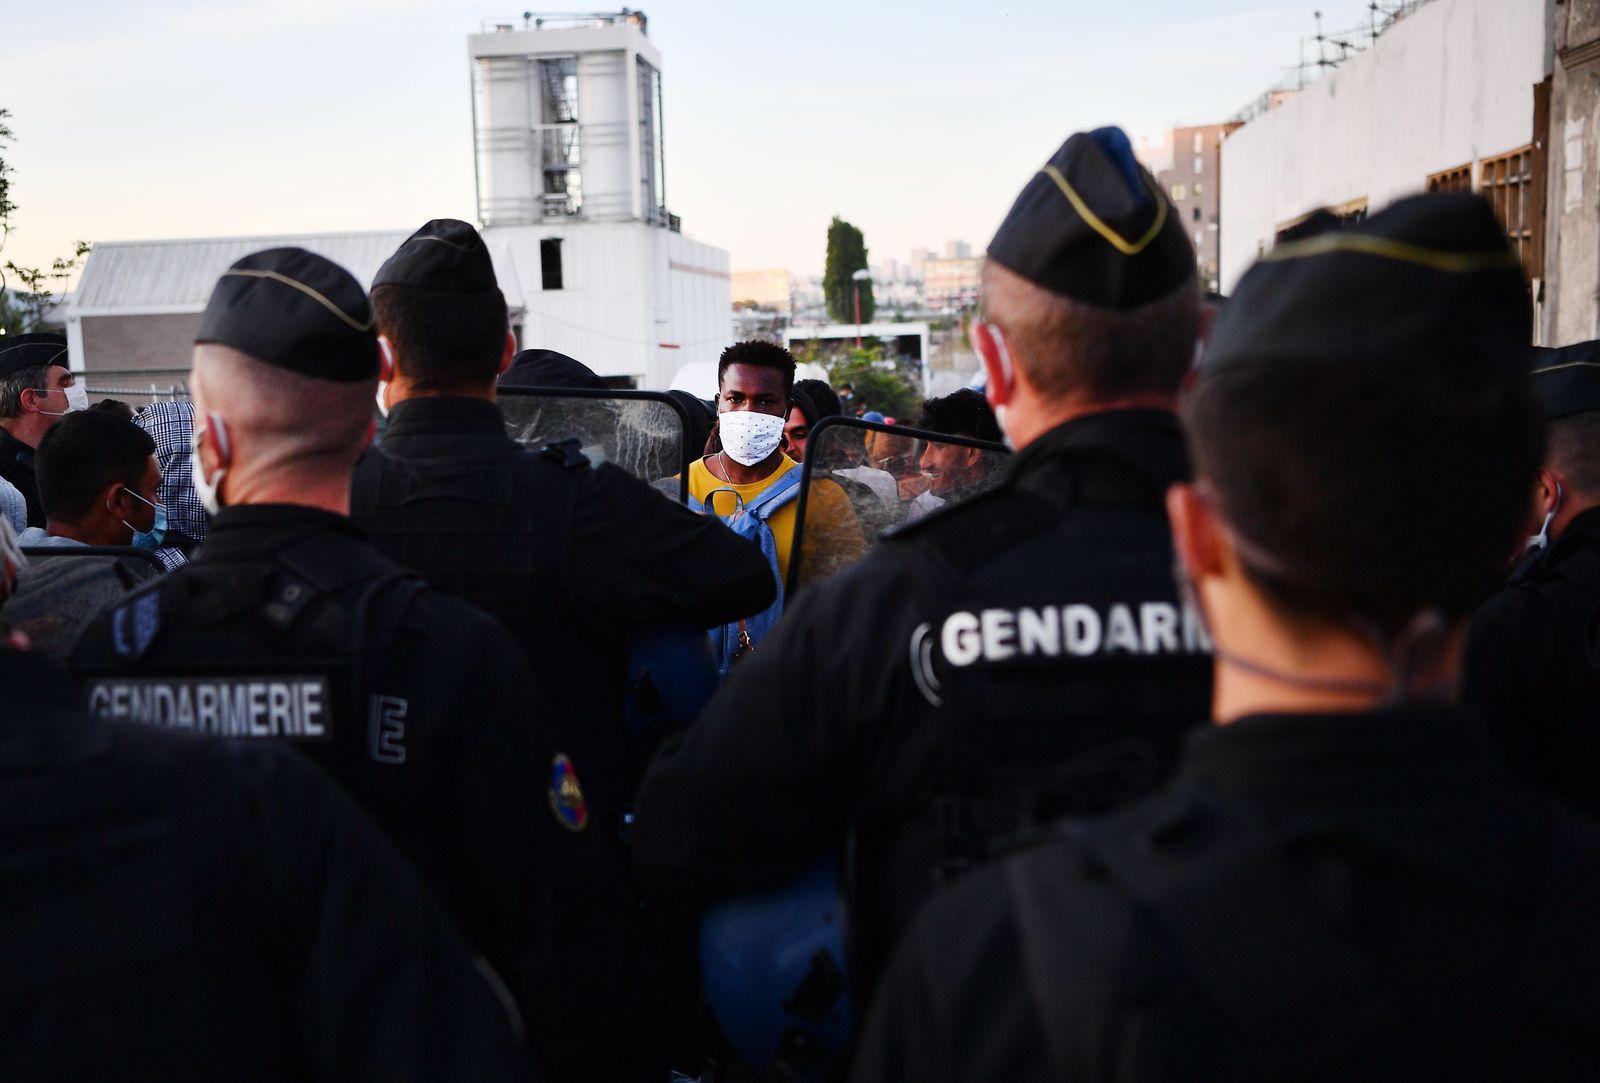 TOPSHOT-FRANCE-EUROPE-MIGRANTS-EVACUATION